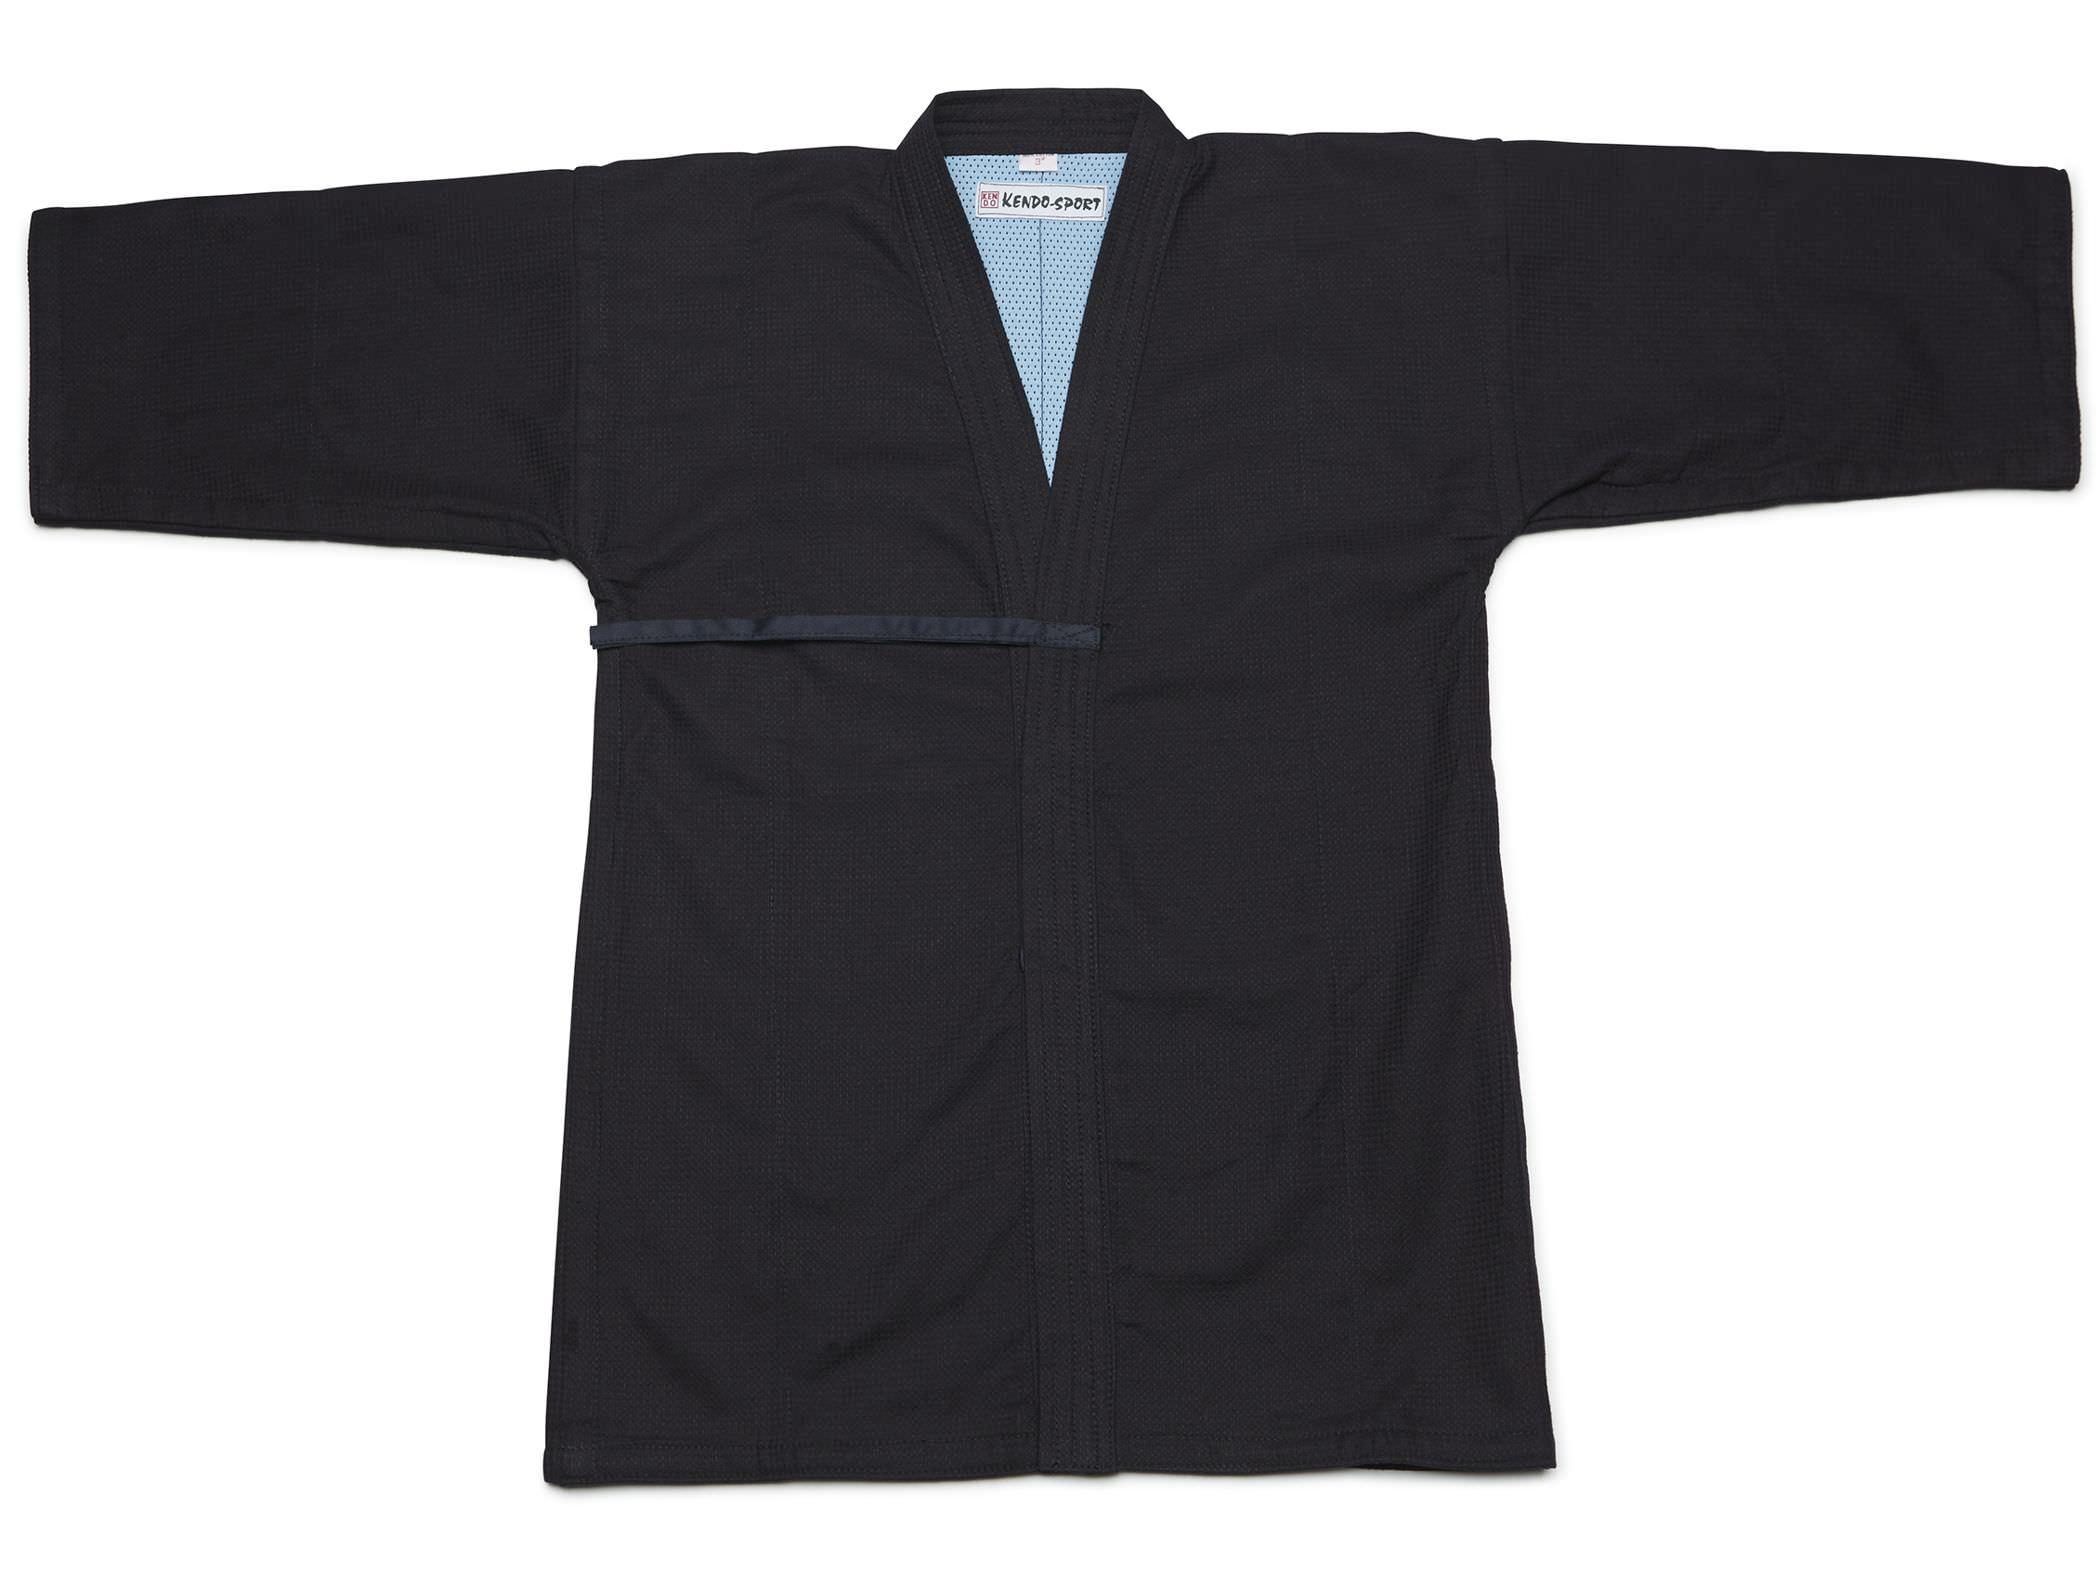 Kendo navy blue Dohimo 4 pcs